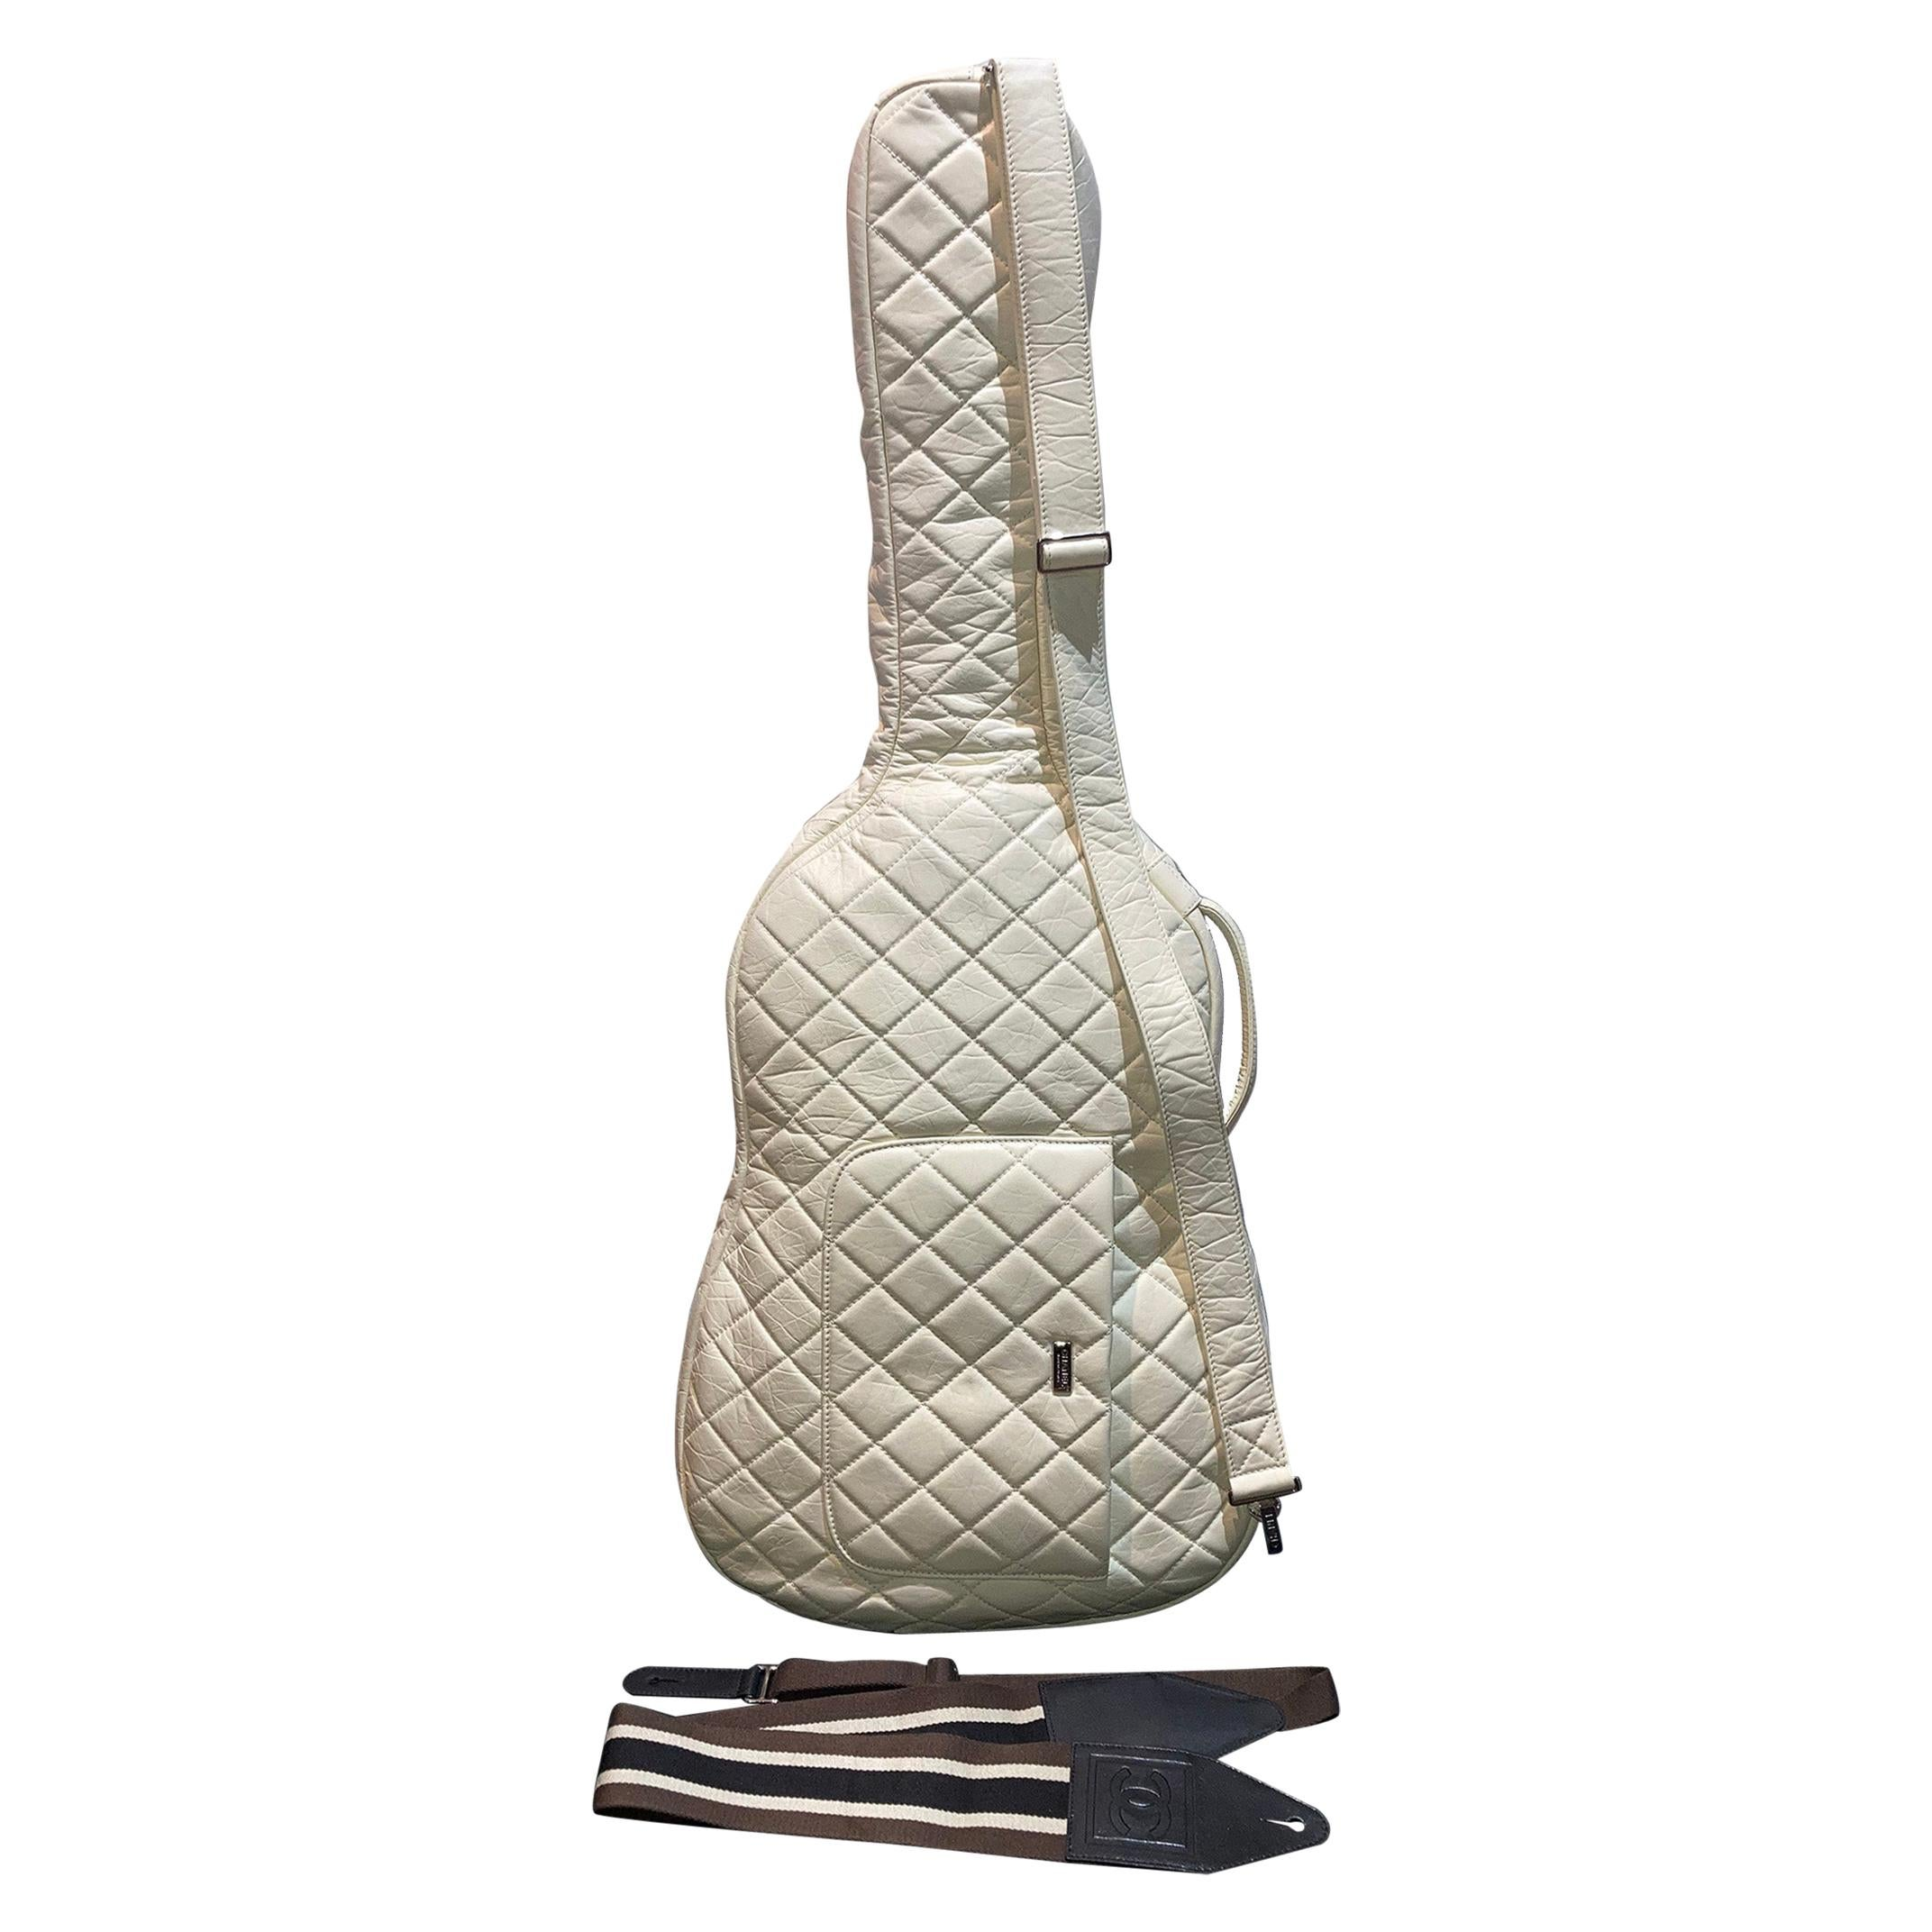 RARE Chanel Guitar Case Runway Piece